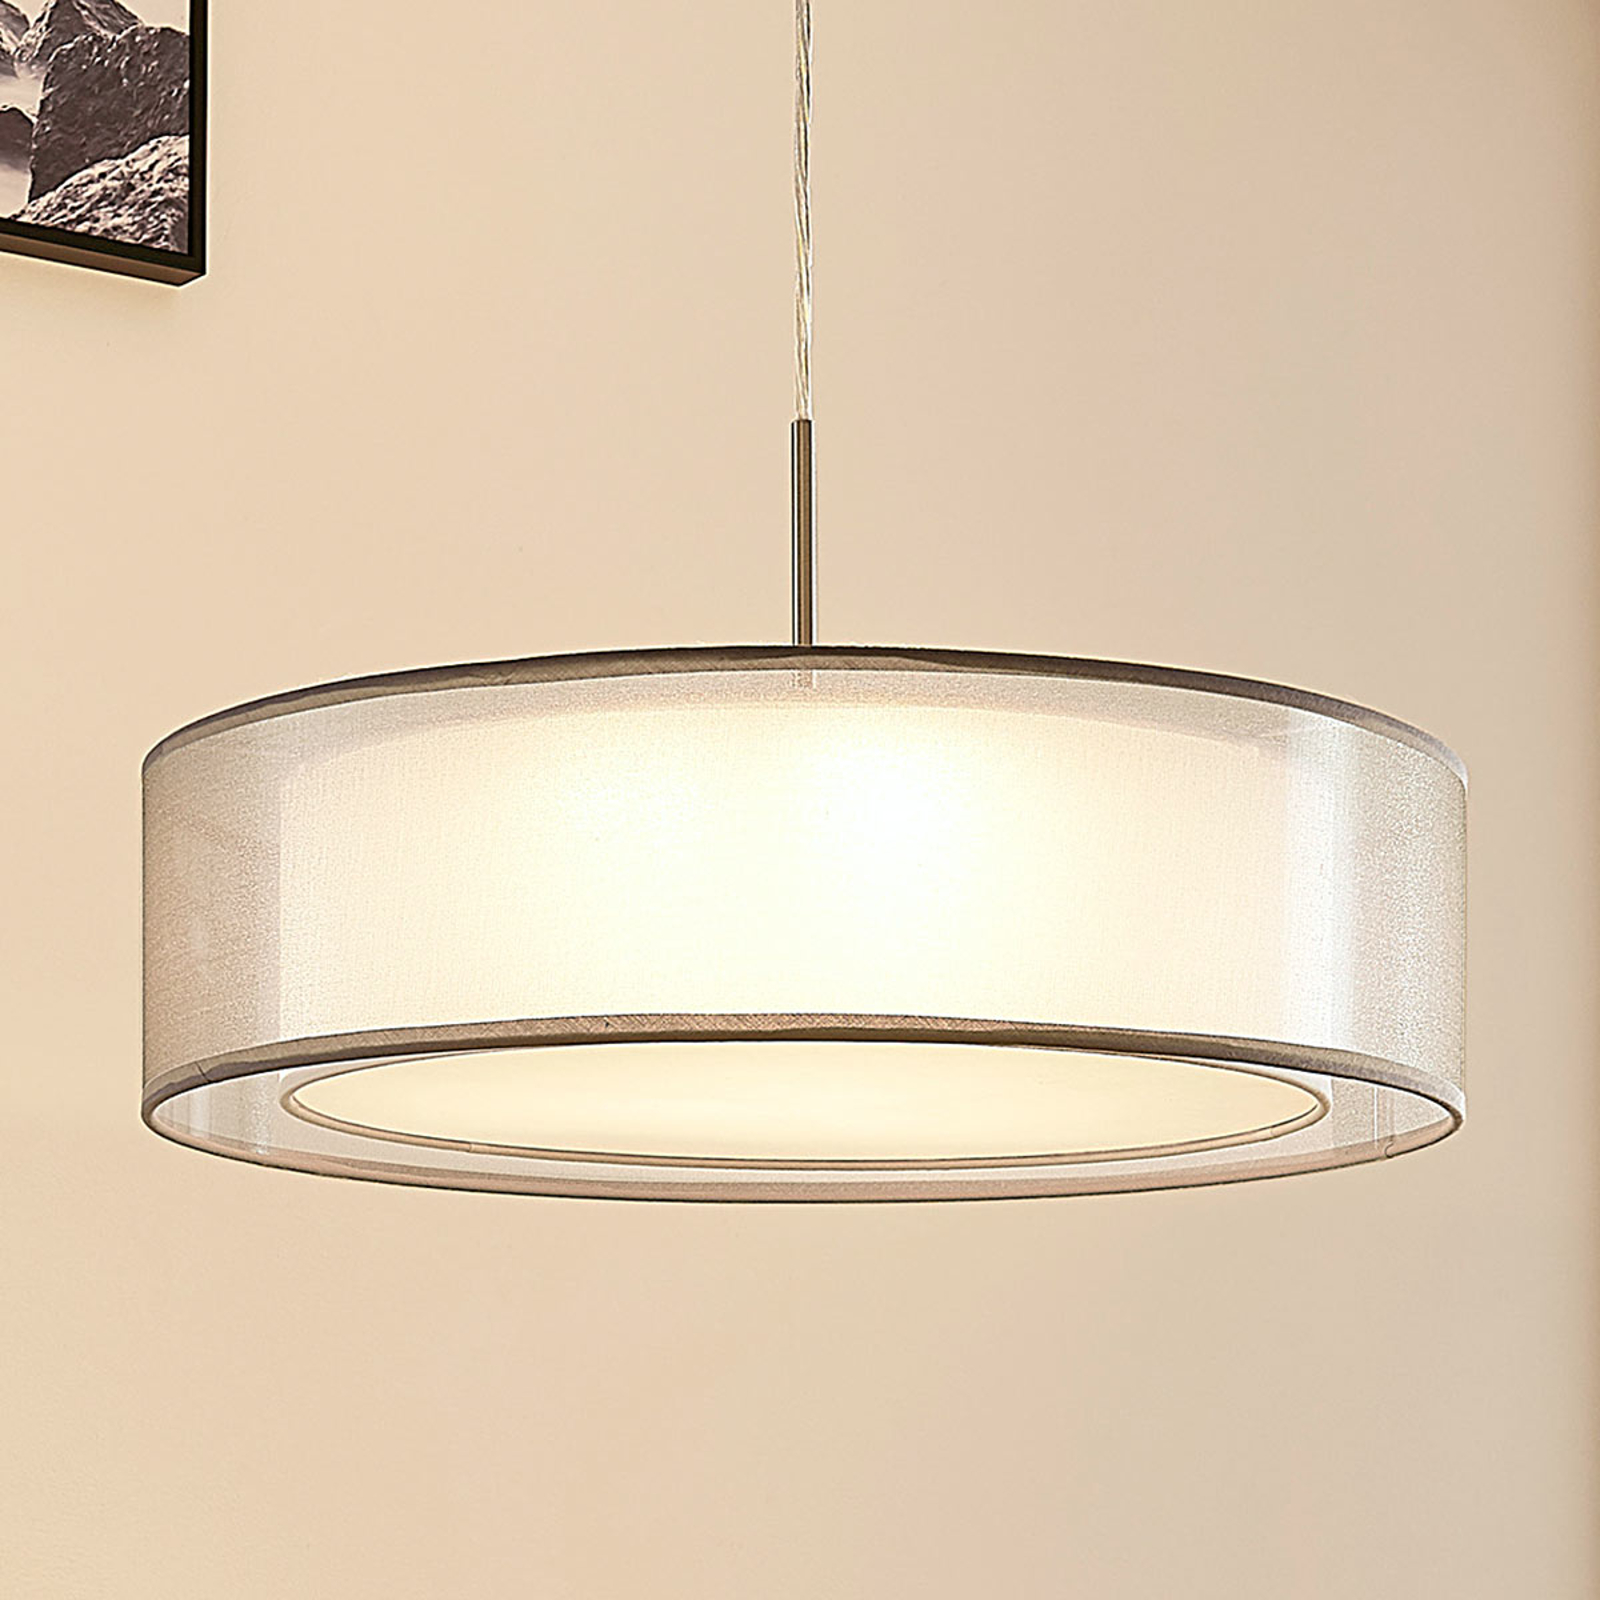 Stoffen hanglamp Amon dimbare LEDs, grijs